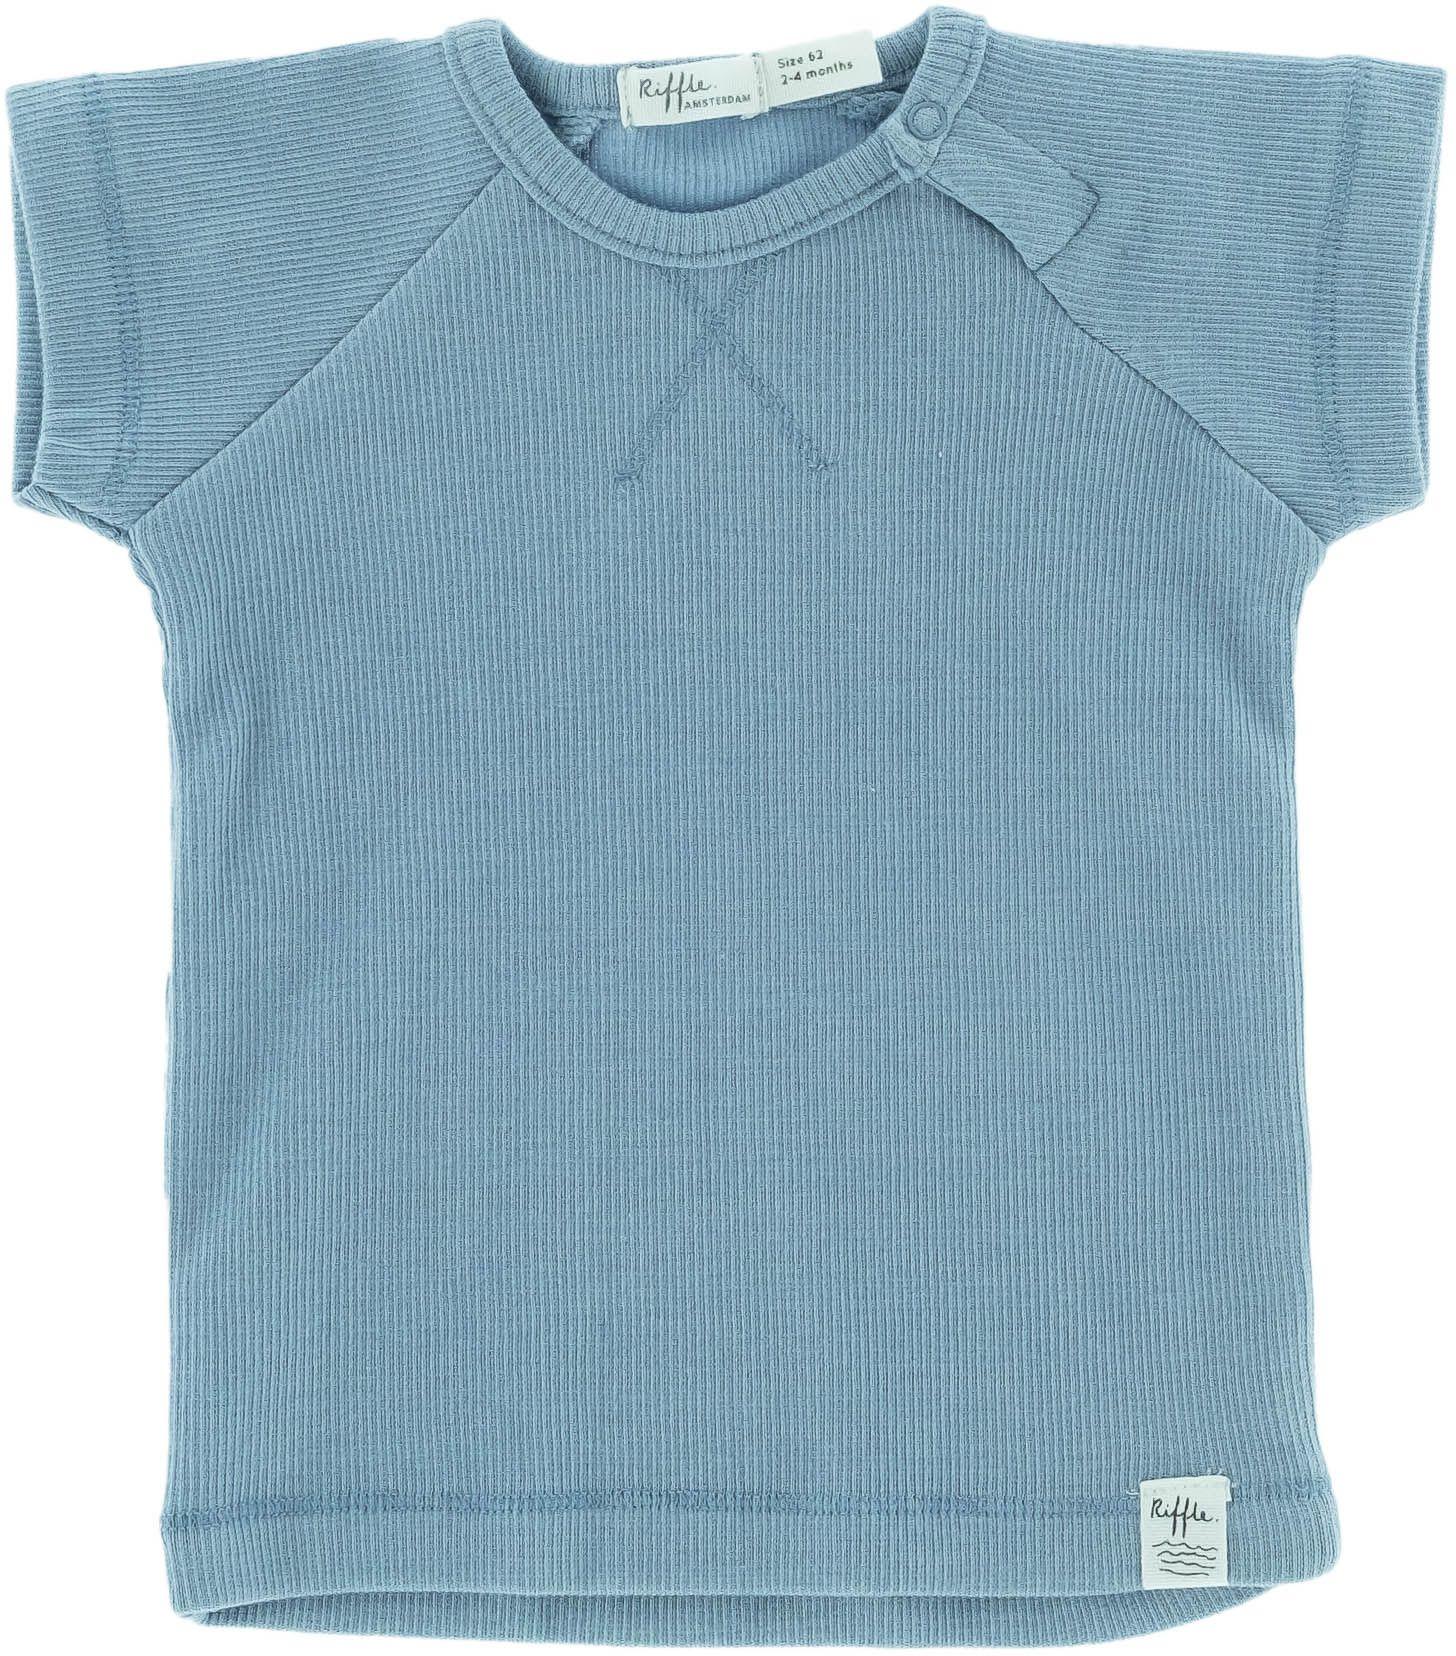 Riffle Amsterdam Kurzarmshirt blue